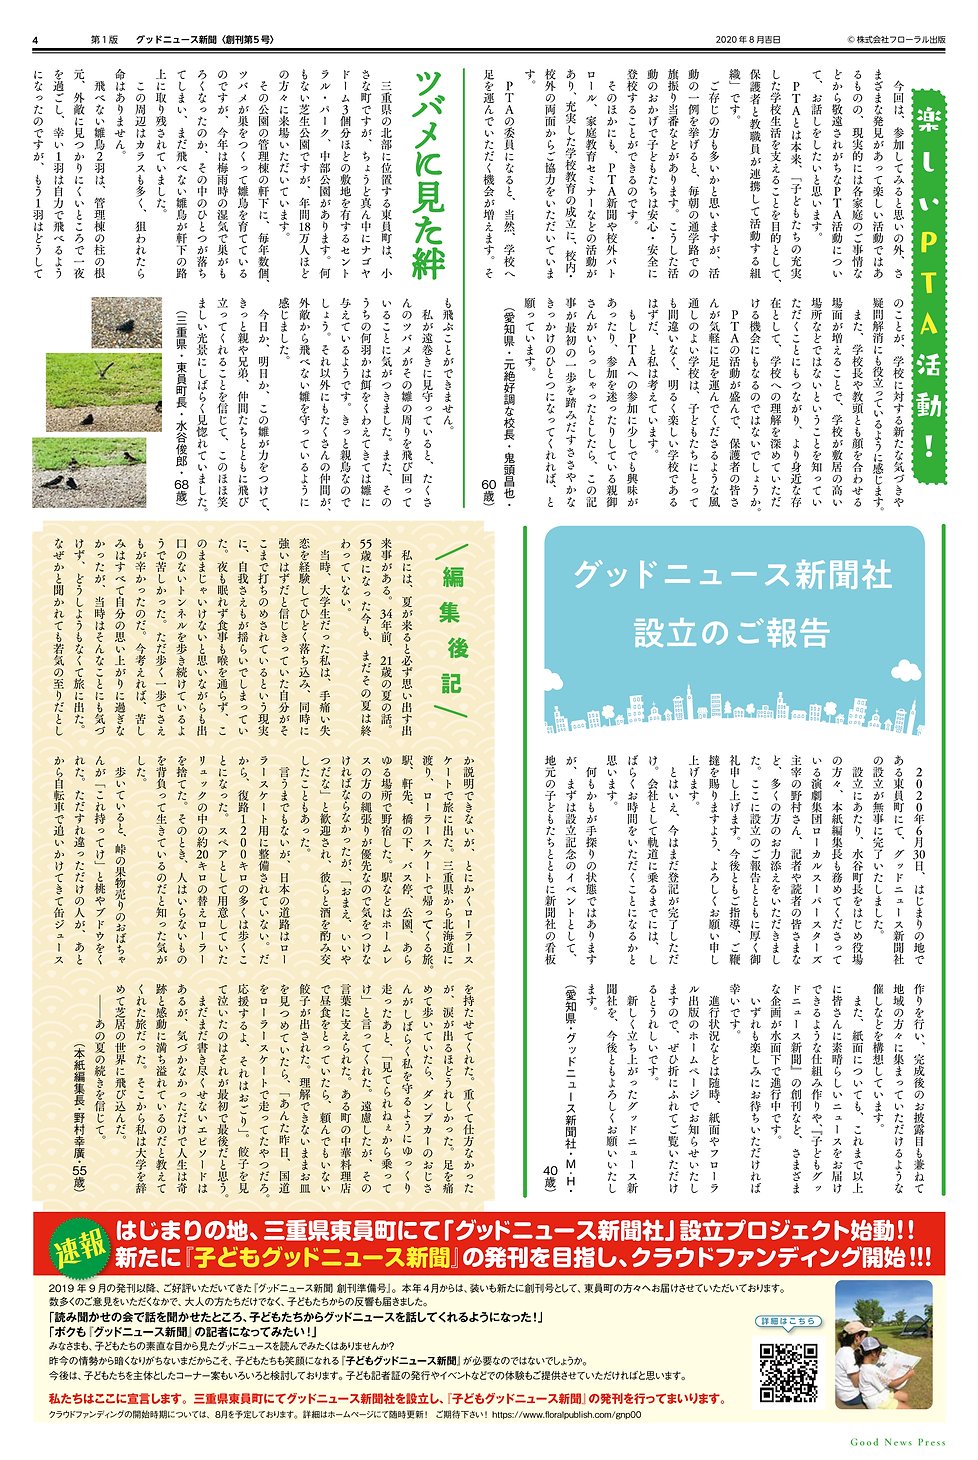 GNP5go_webyo (1)_ページ_4.png